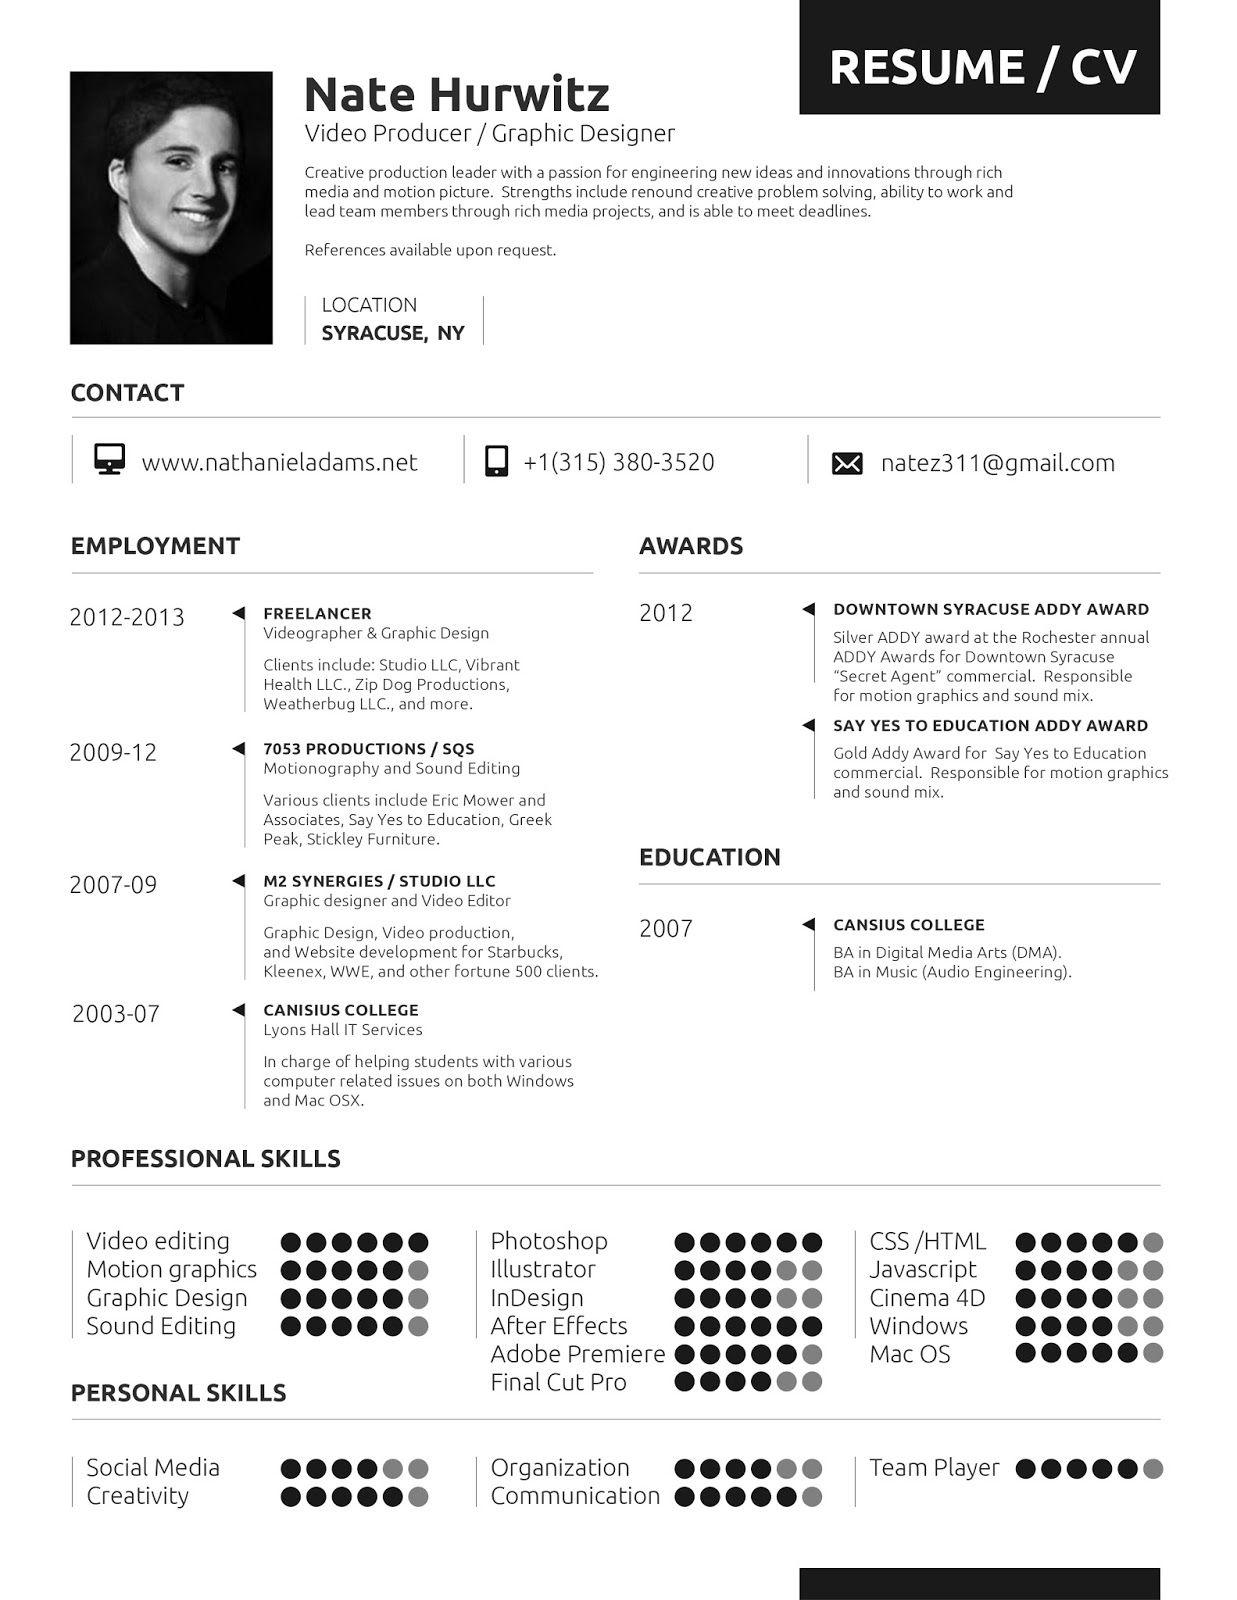 Resume Format Vfx Artist Resume format, Artist resume